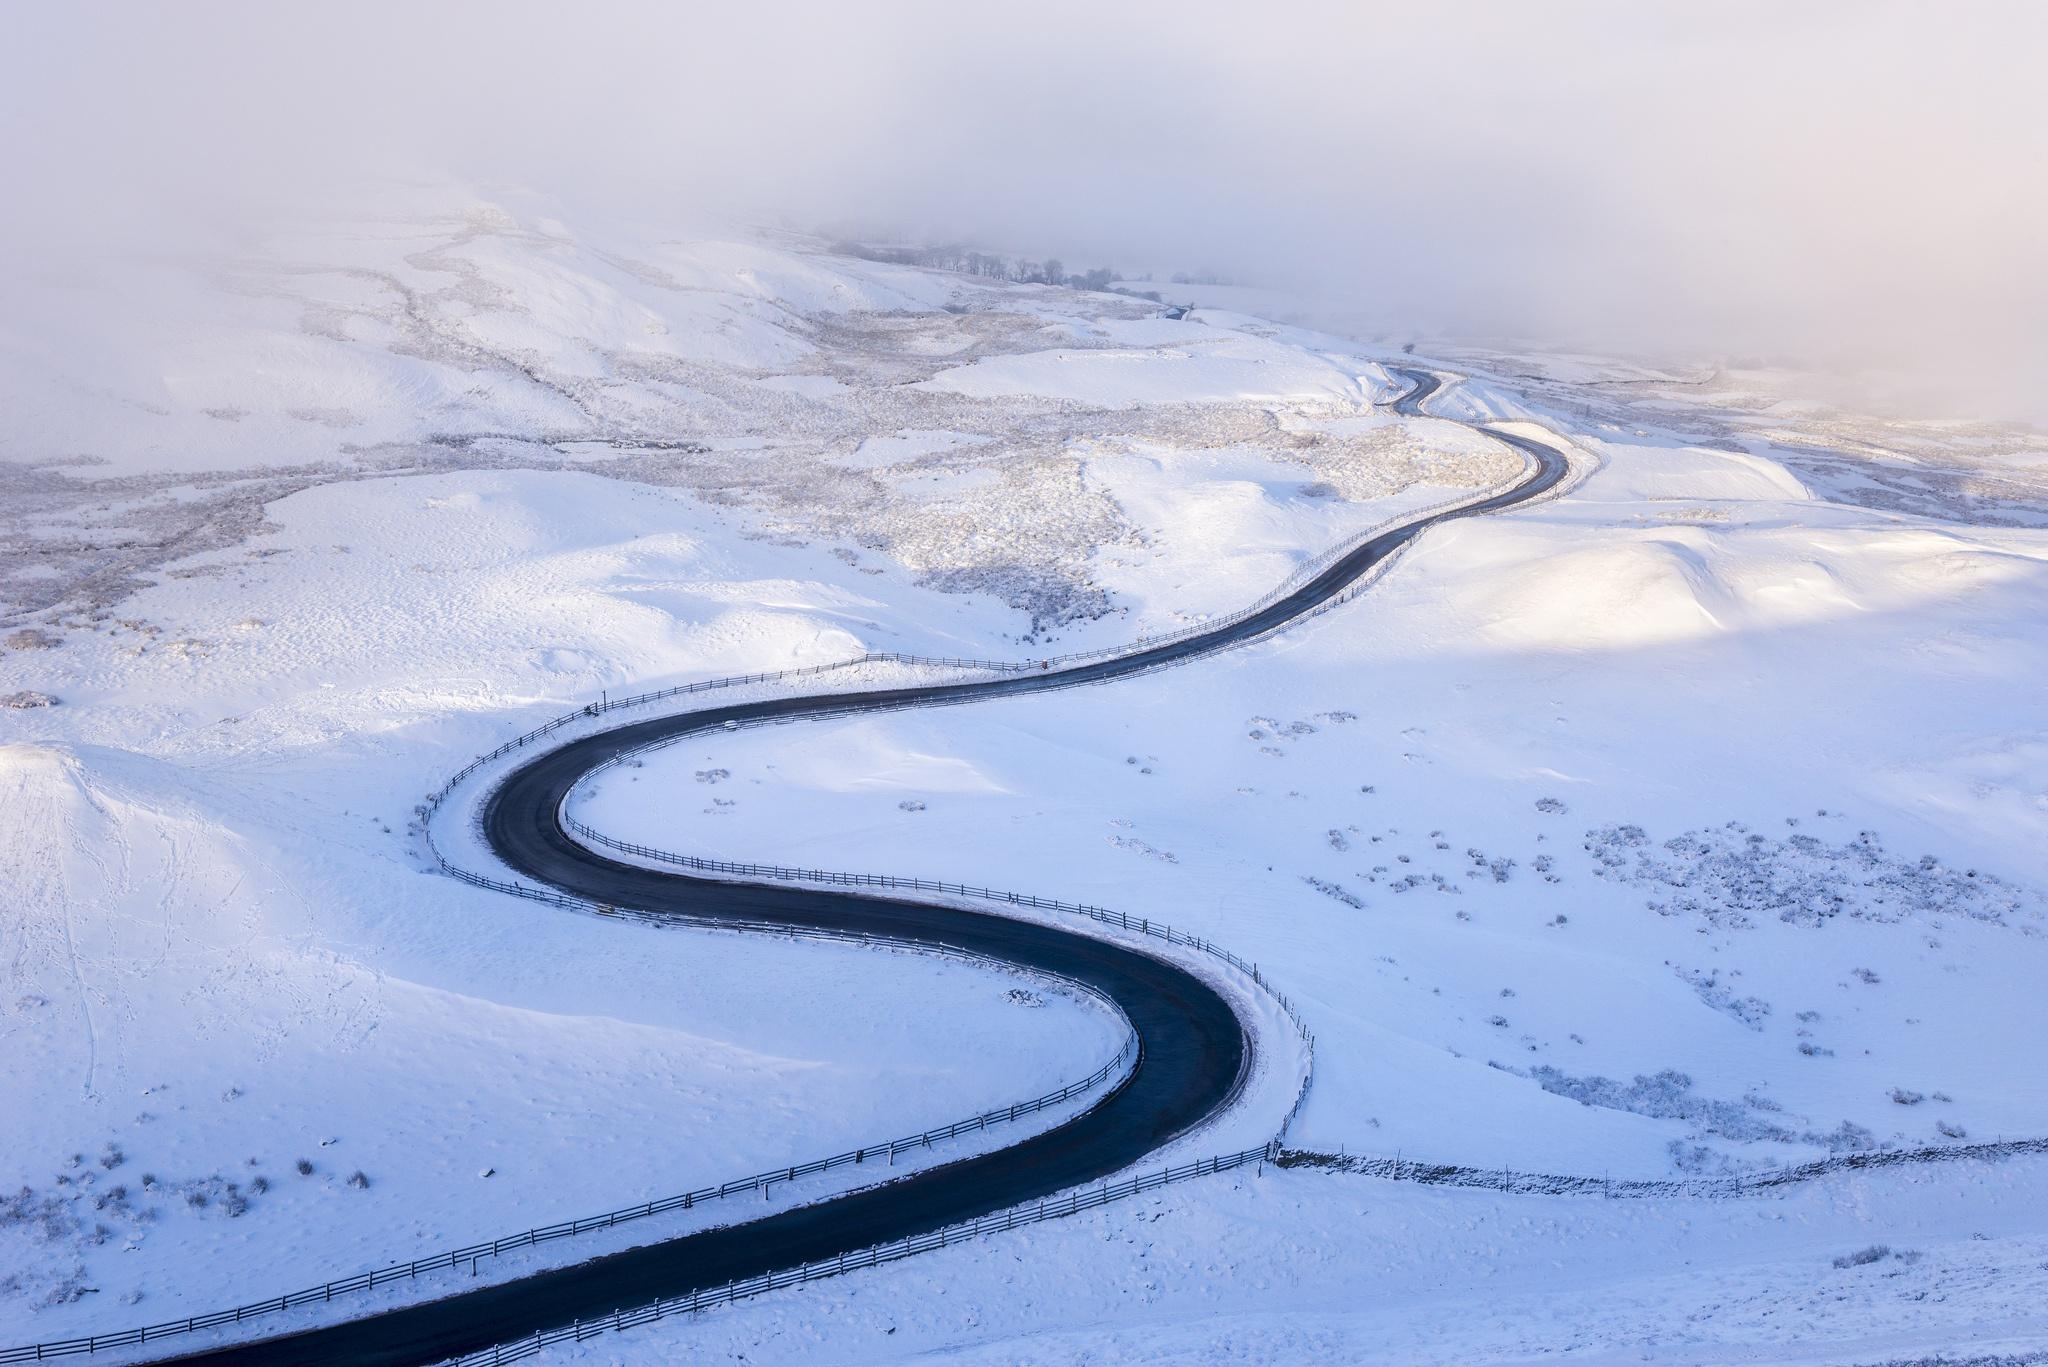 Landscape Nature Road Snow Winter 2048x1367